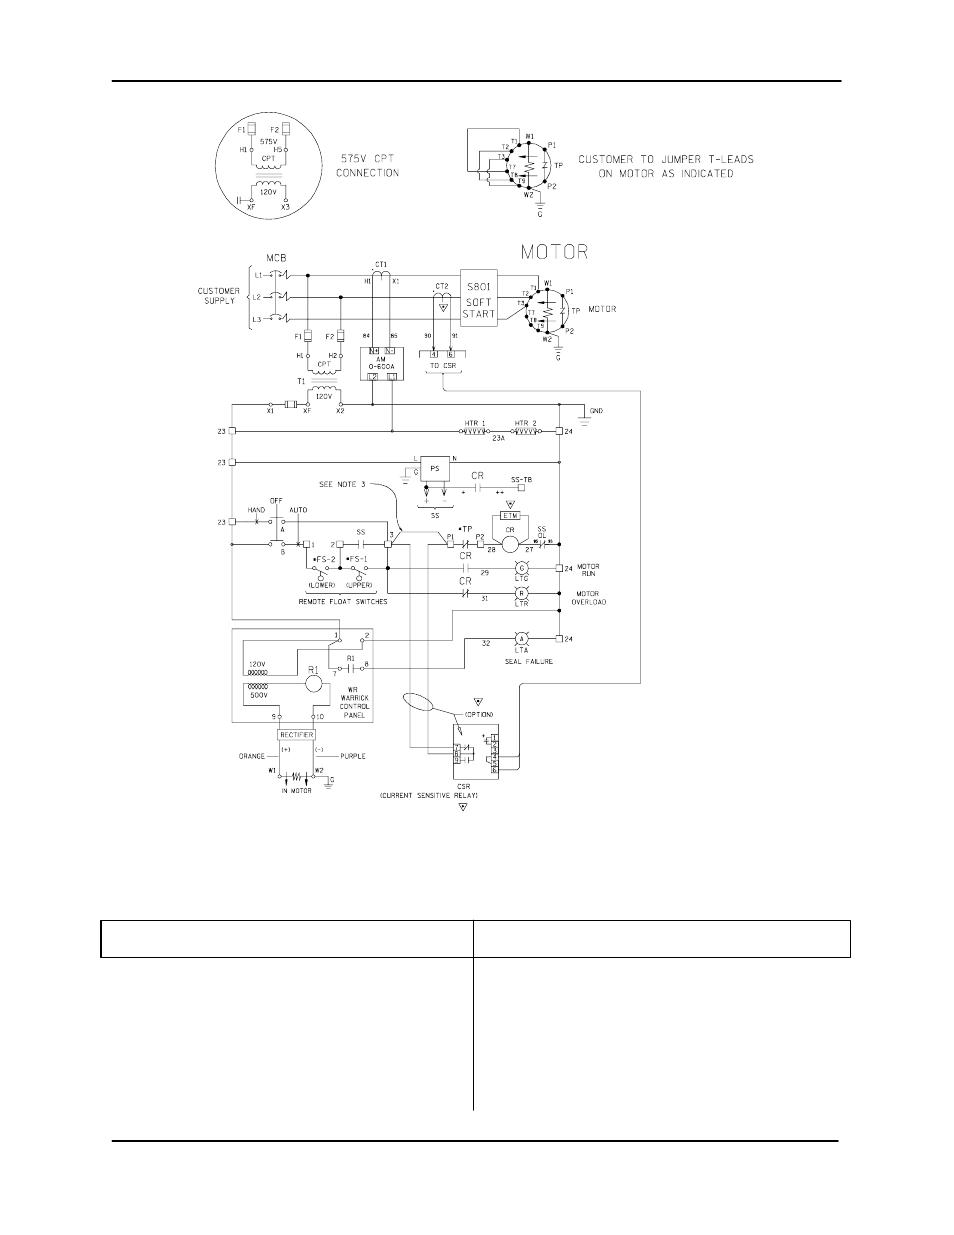 light to switch wiring diagram nissan patrol gu stereo repair parts list | gorman-rupp pumps s4c65-e10 460/3 861279 thru 1142084 user manual page 29 / 37